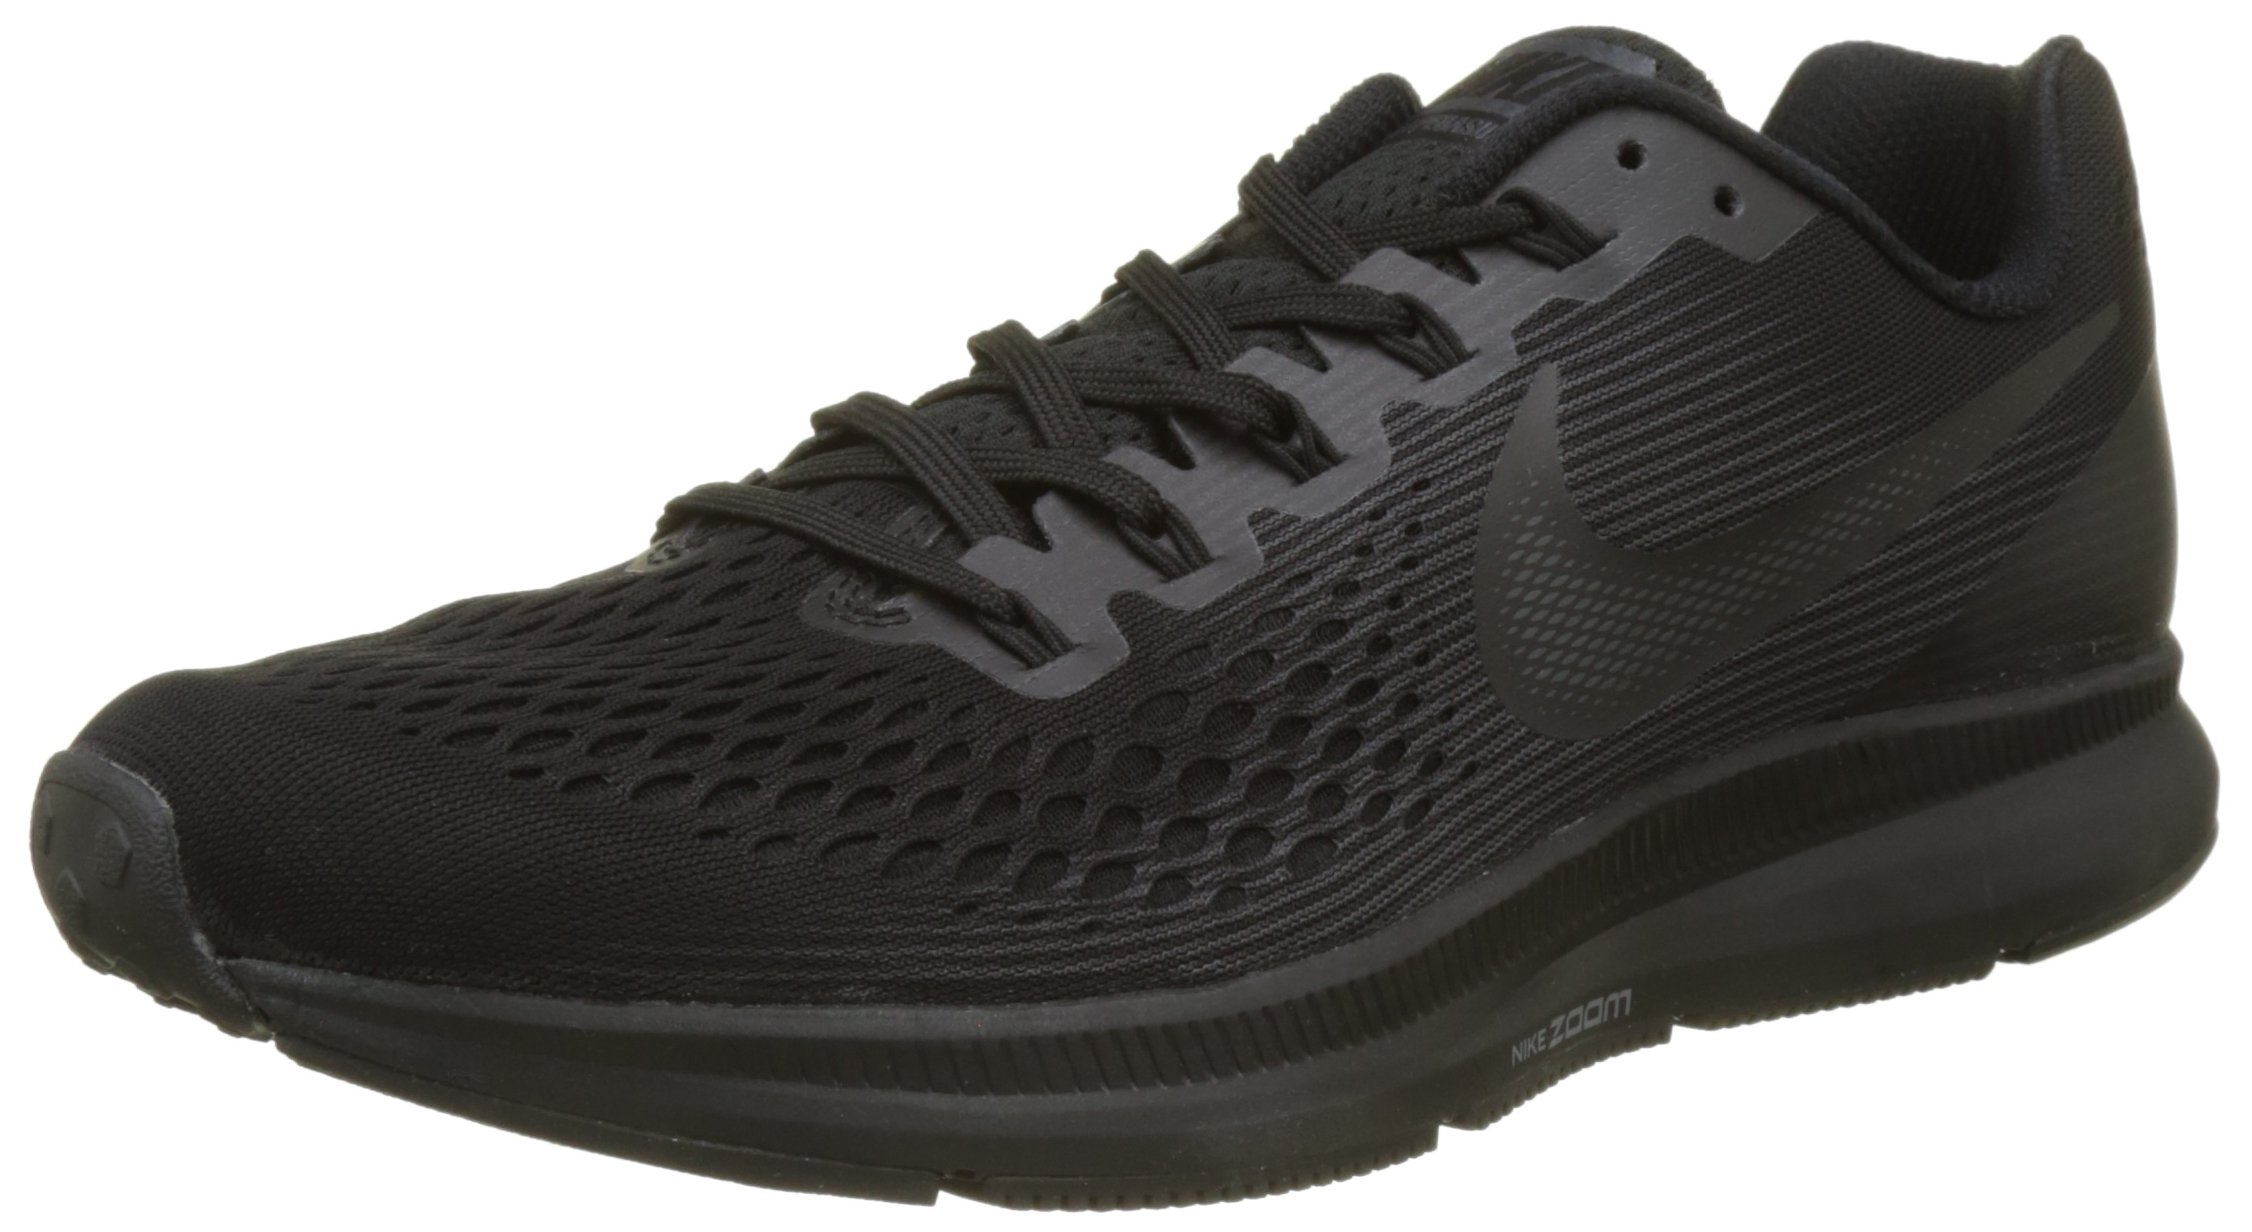 Nike Men's Air Zoom Pegasus 34 Running Shoe Black/Dark Grey-anthracite 8 D(M) US